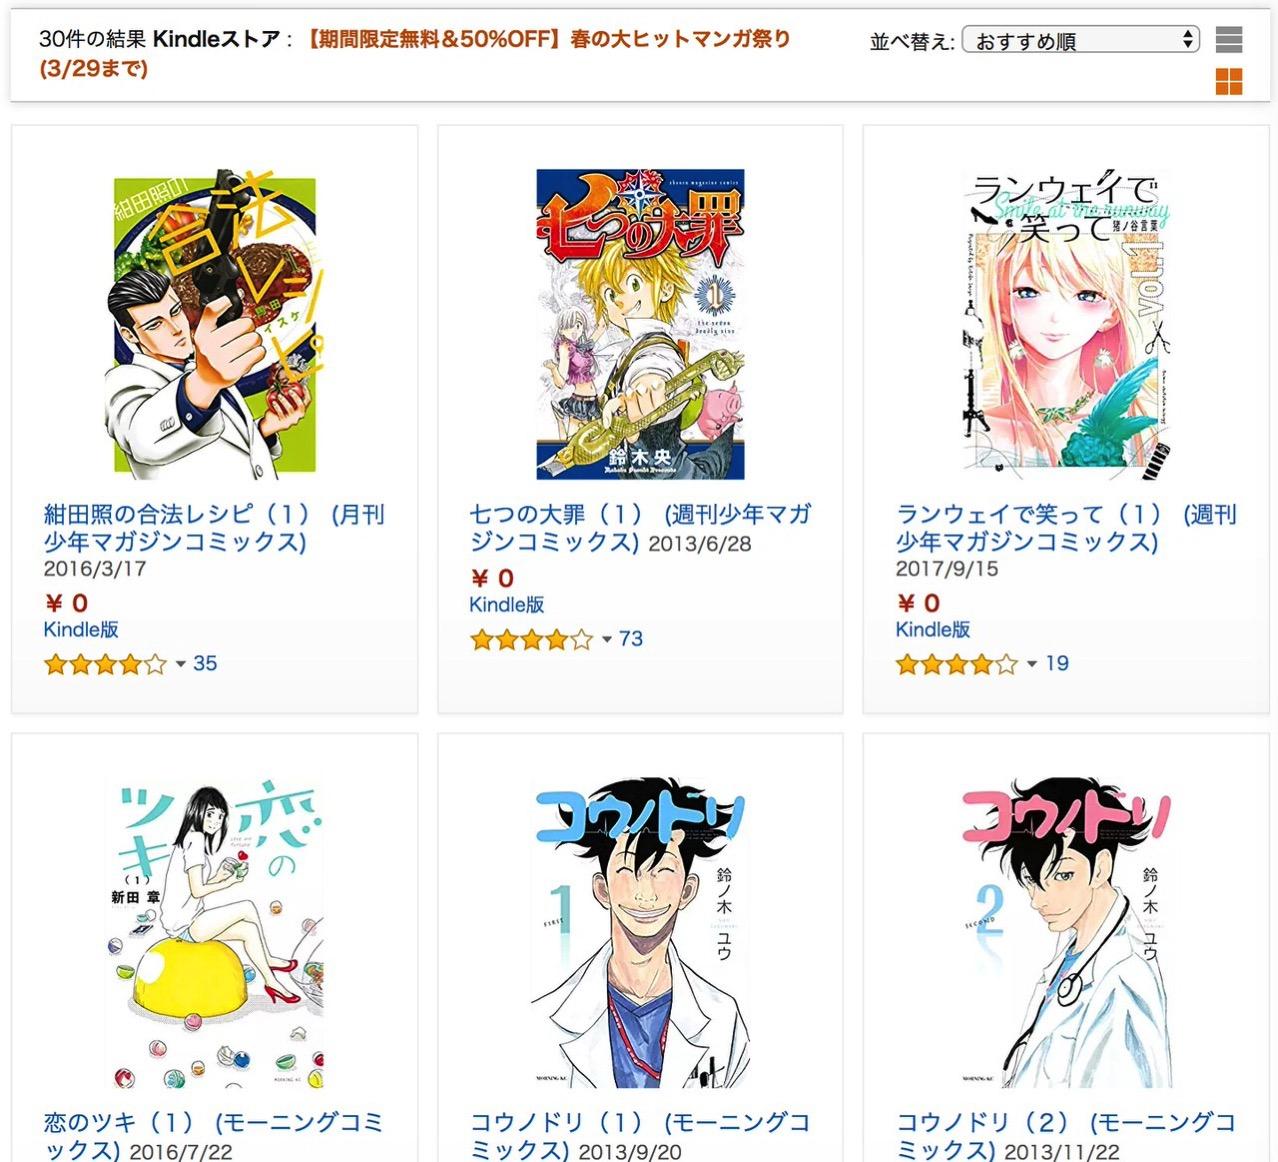 【Kindleセール】期間限定無料&50%OFF「春の大ヒットマンガ祭り」(3/29まで)